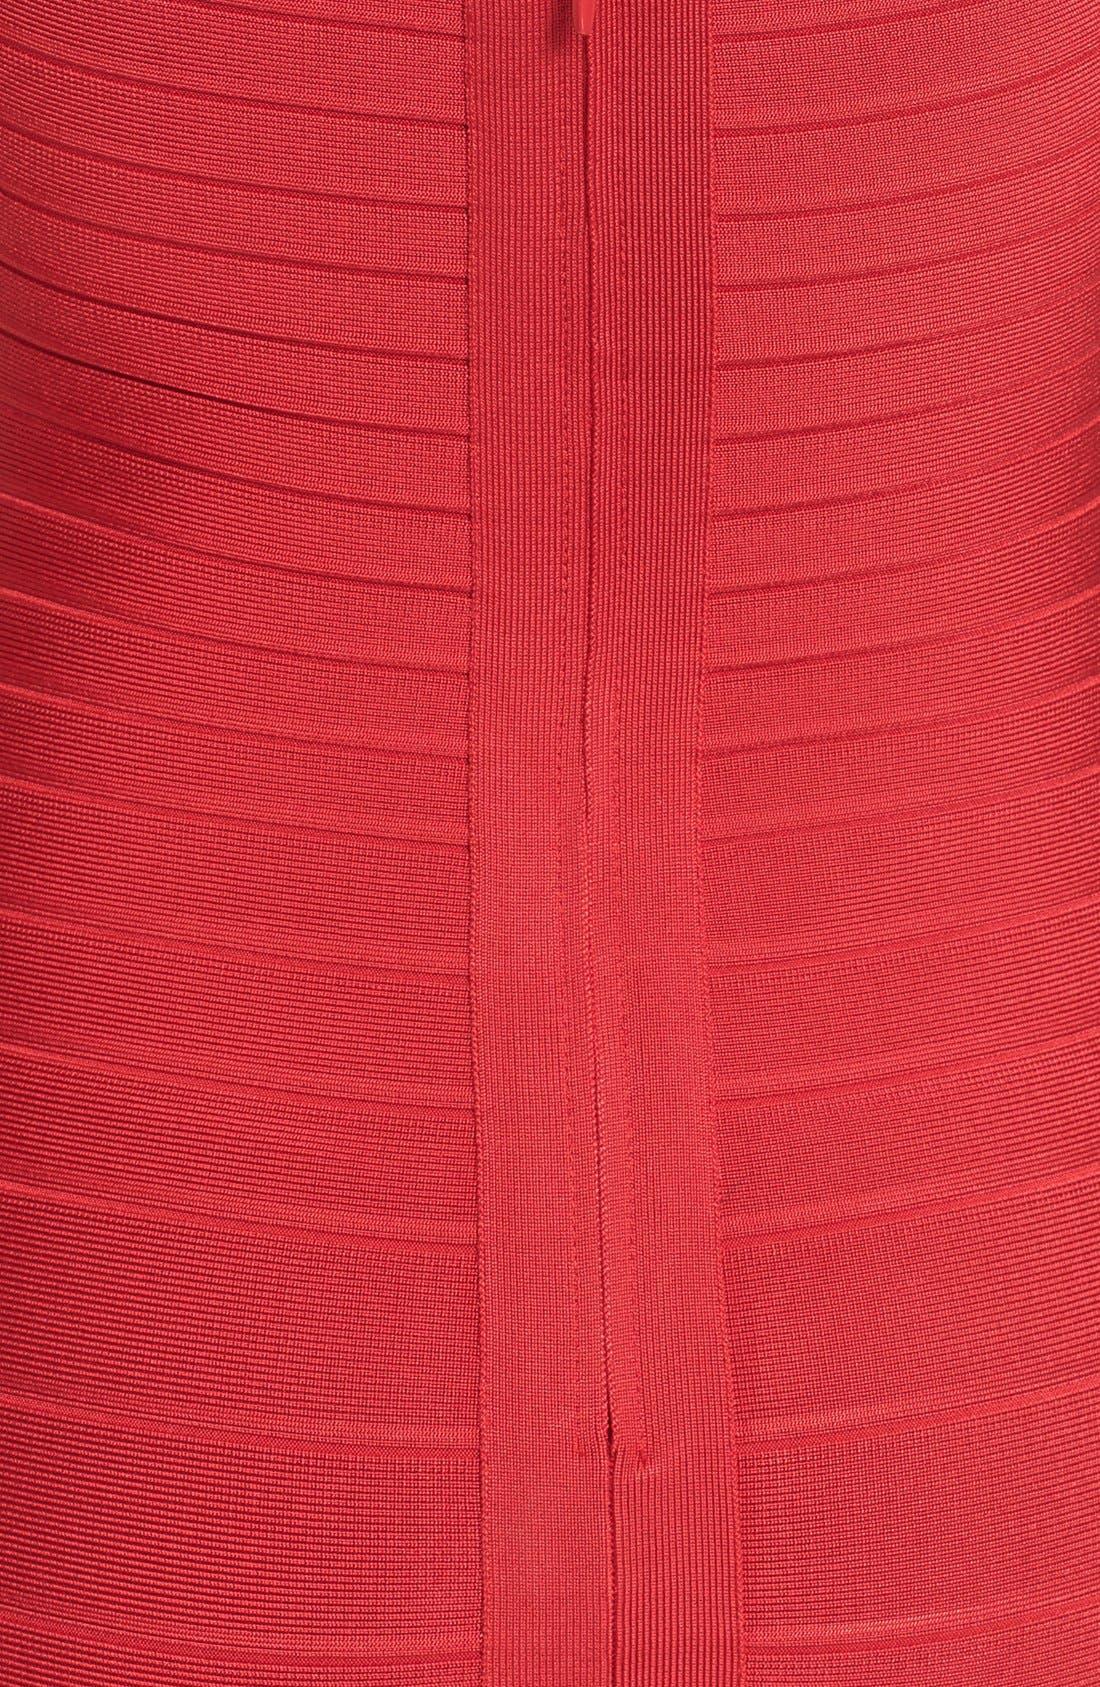 HERVE LEGER,                             Open Back Bandage Dress,                             Alternate thumbnail 3, color,                             616